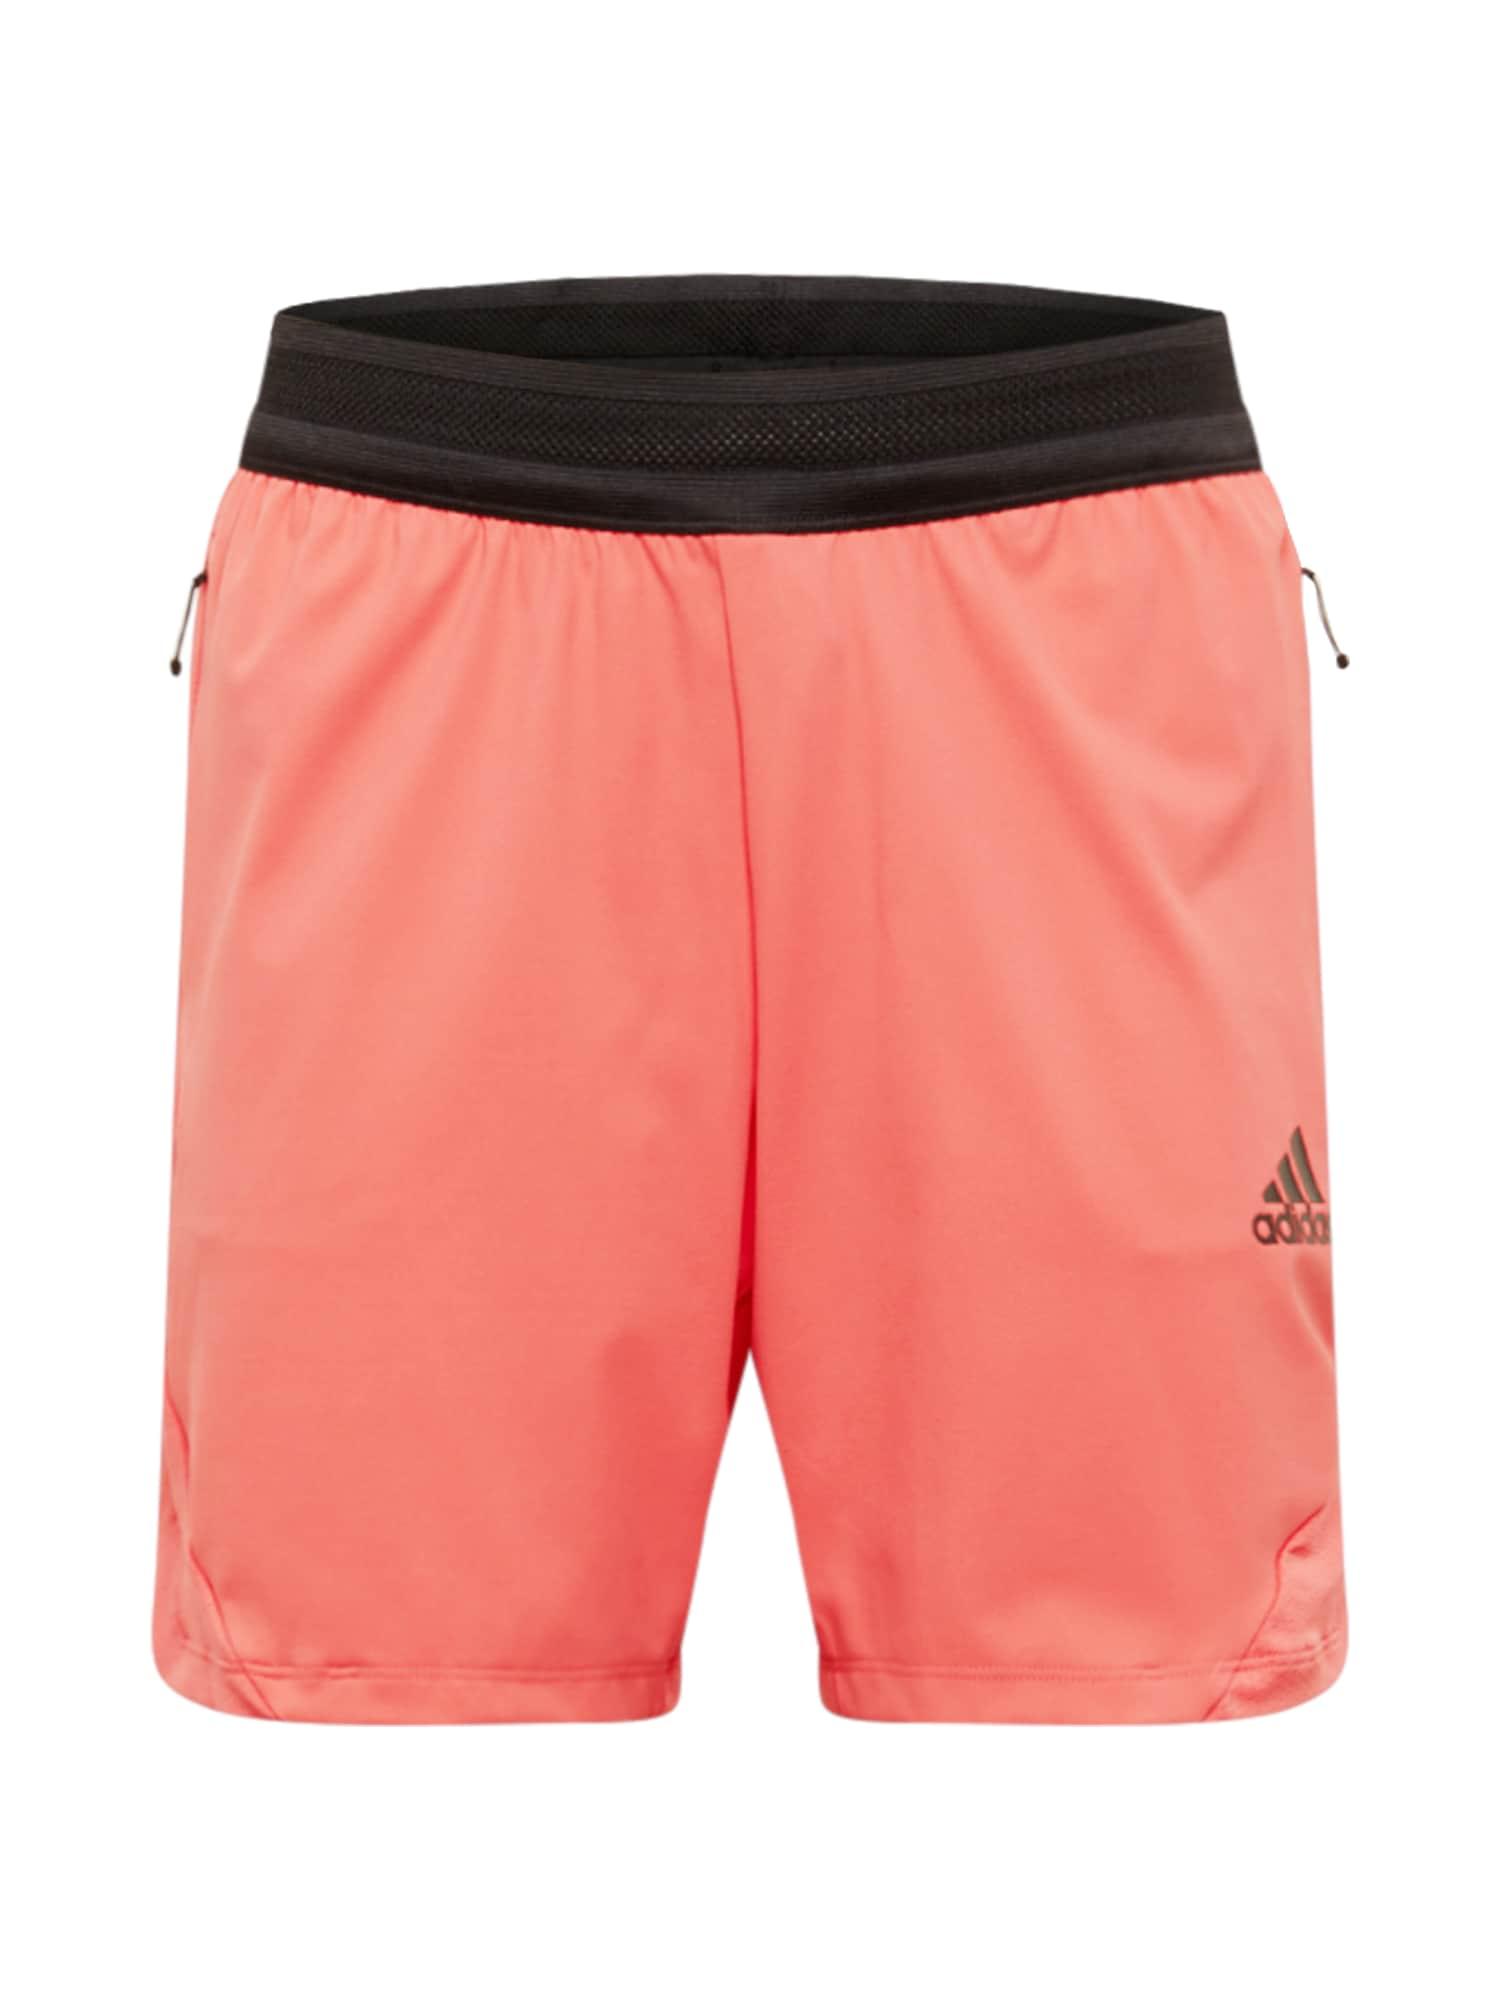 ADIDAS PERFORMANCE Športové nohavice  lososová / čierna